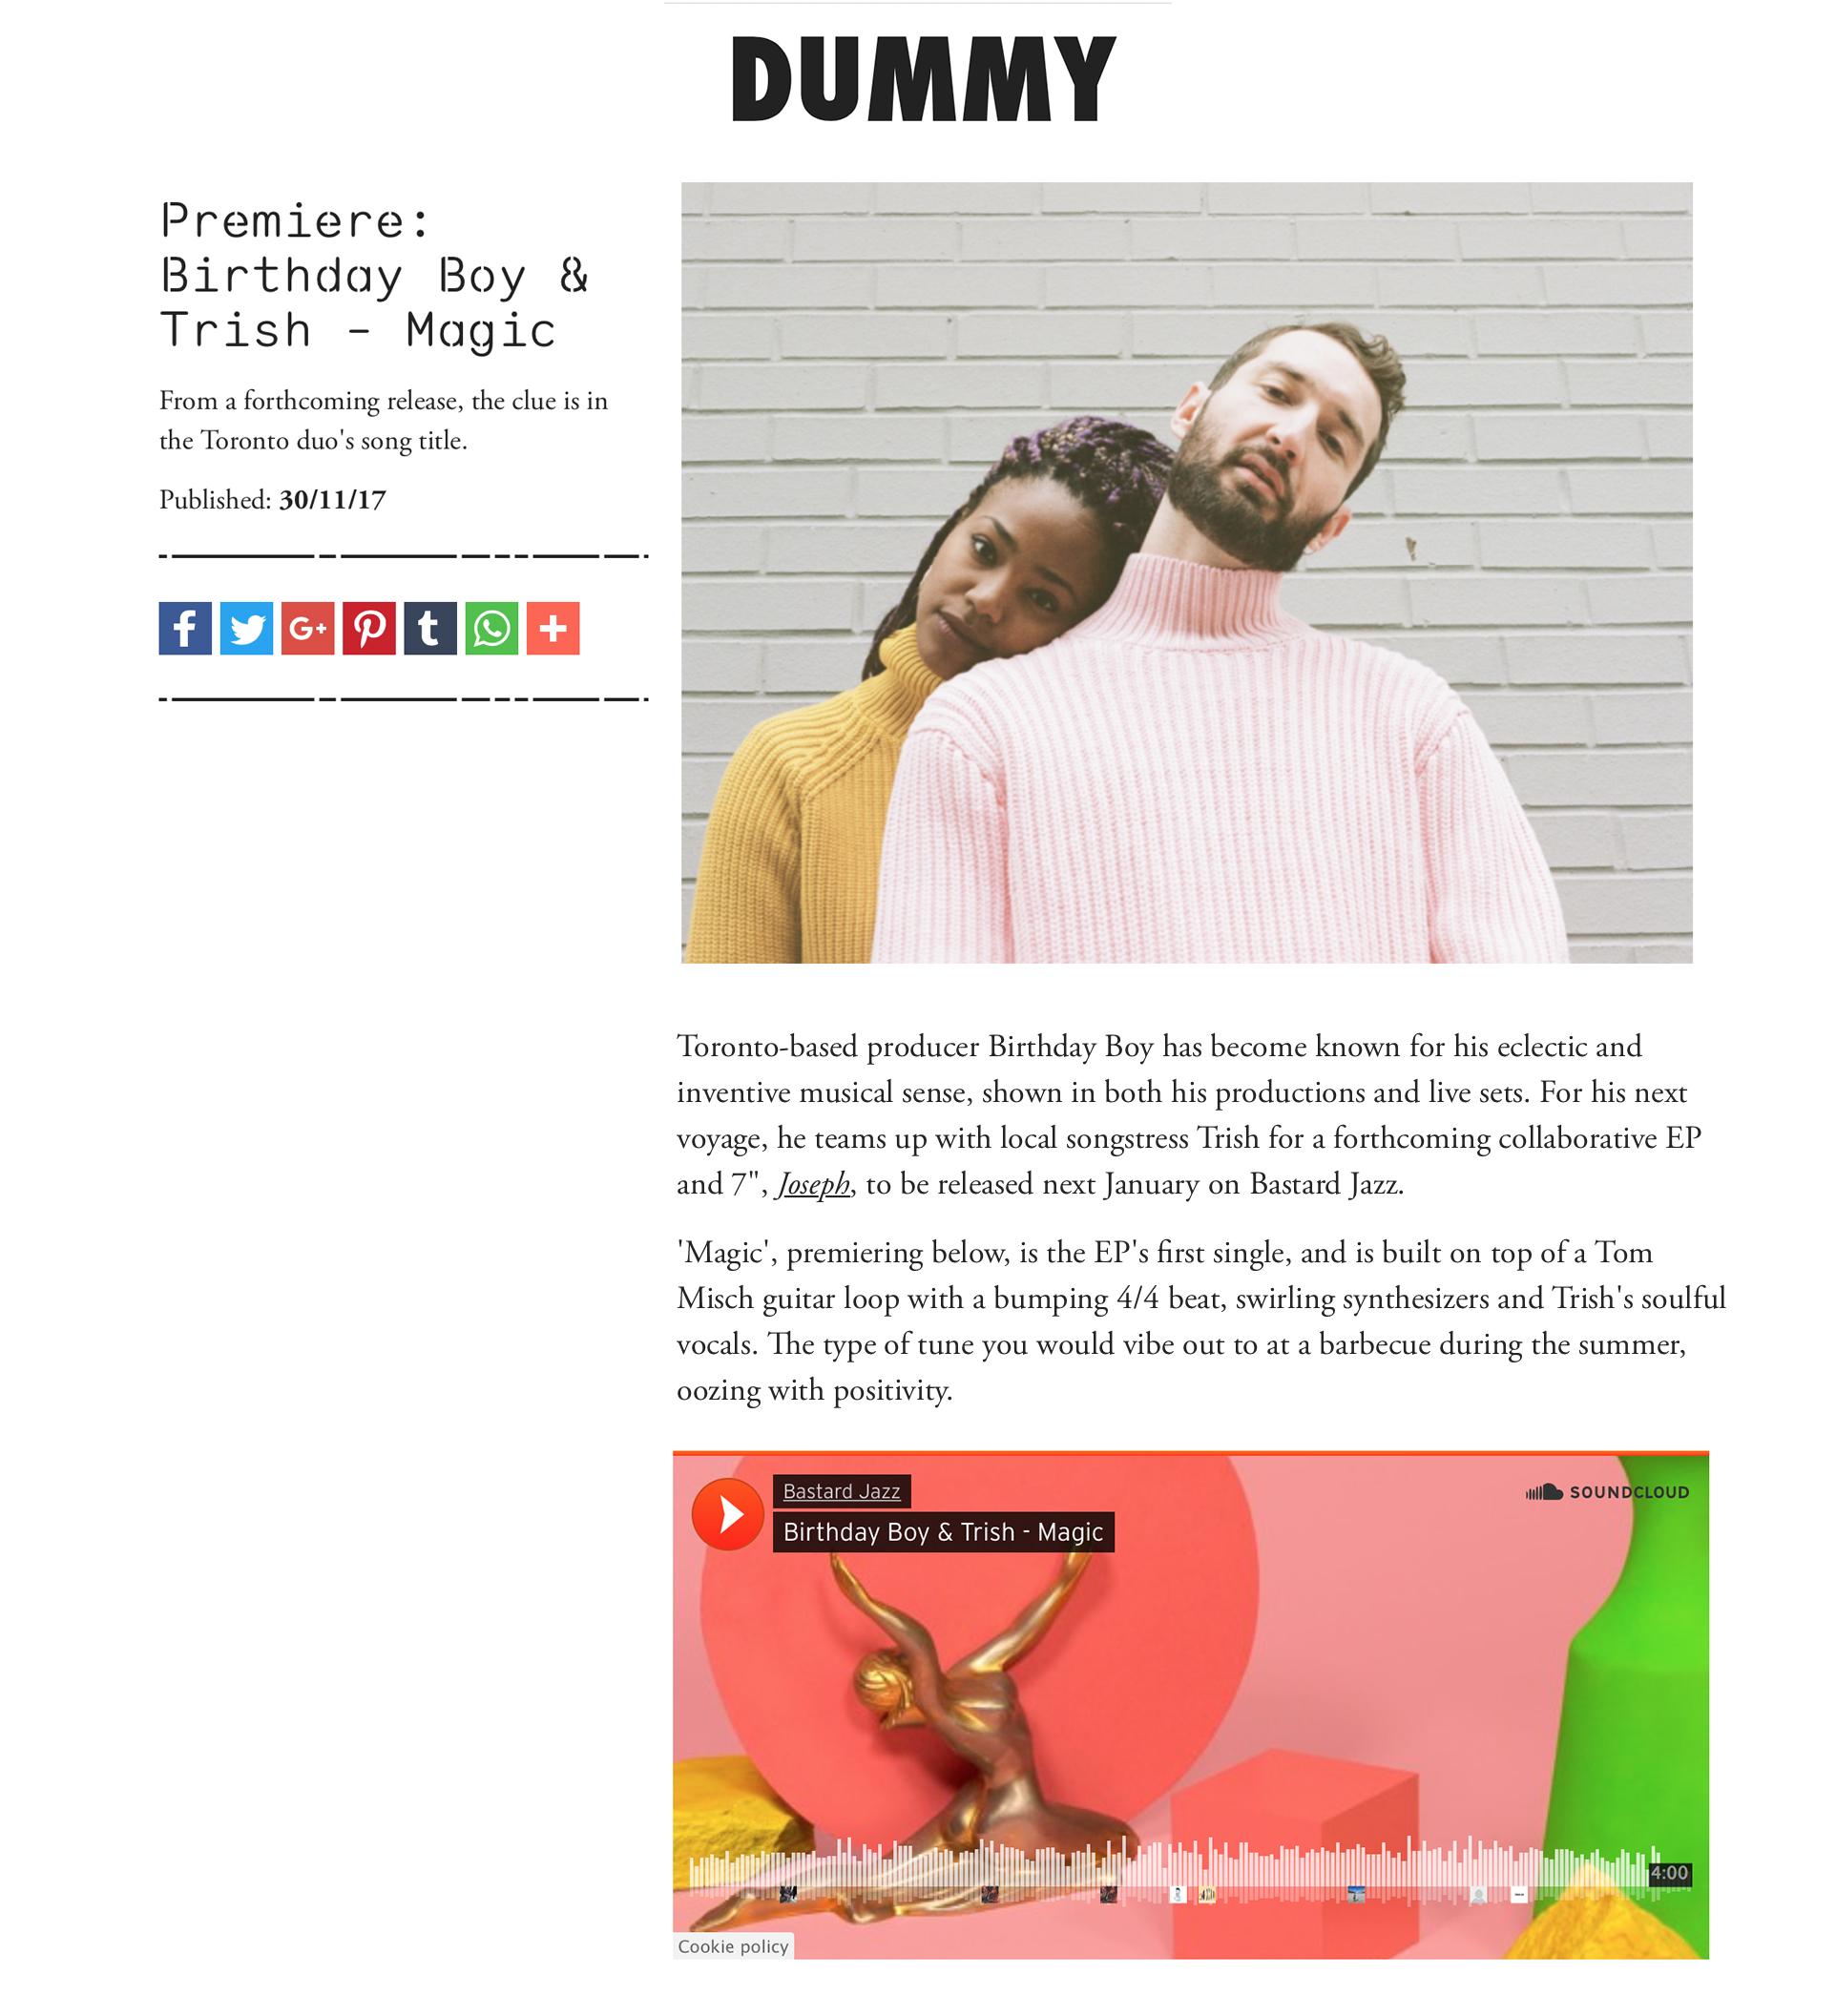 Dummy: Birthday Boy & Trish Dummy premiere